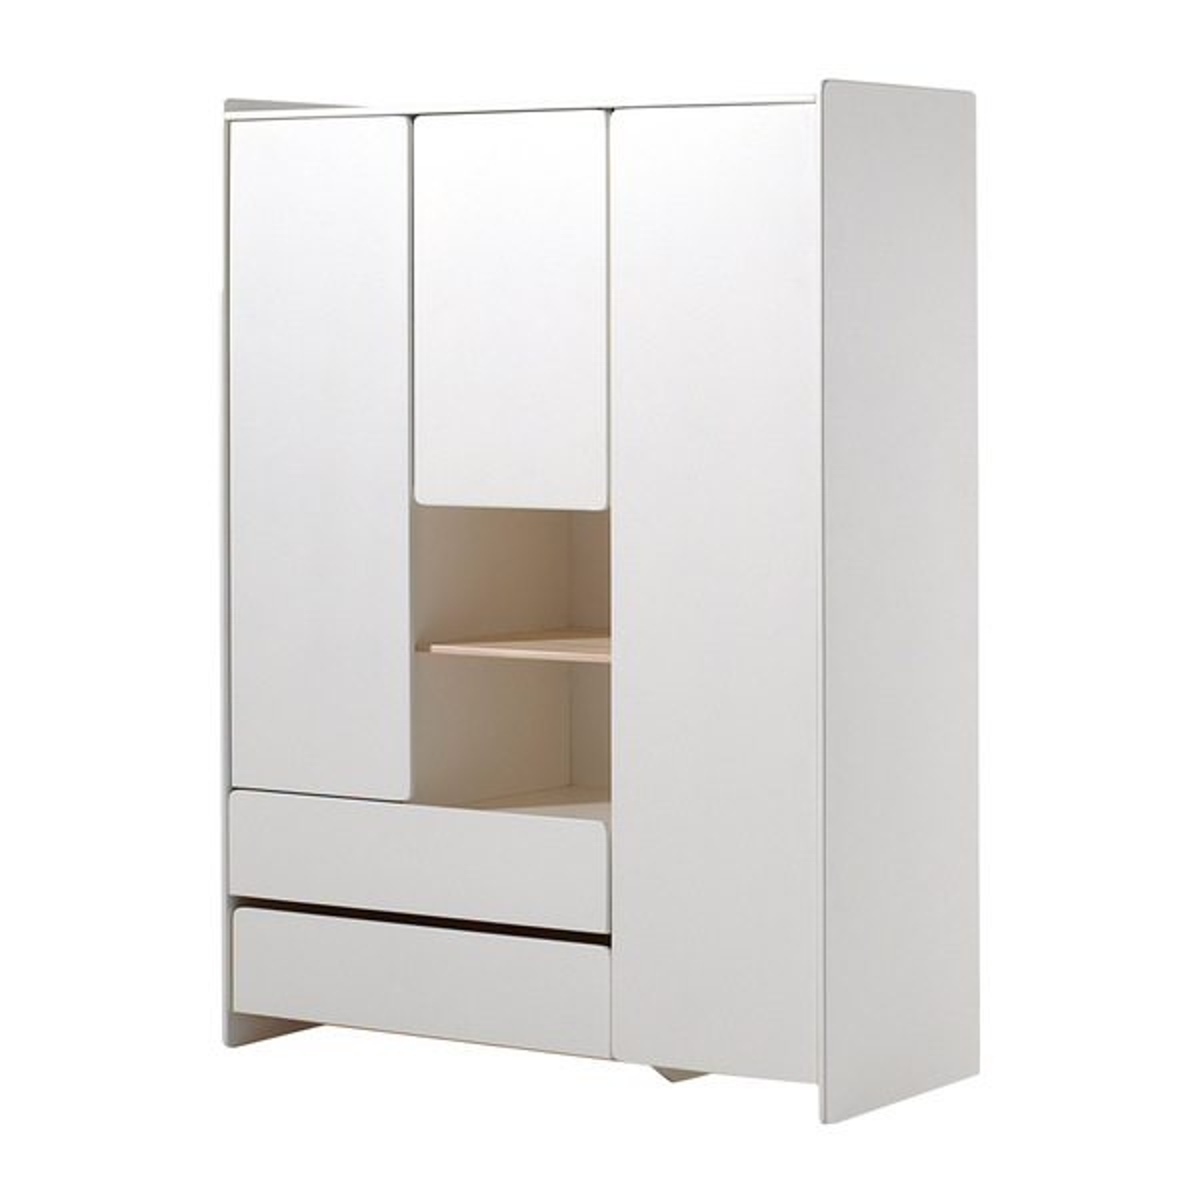 Vipack - Armoire 3 portes Kiddy - Blanc